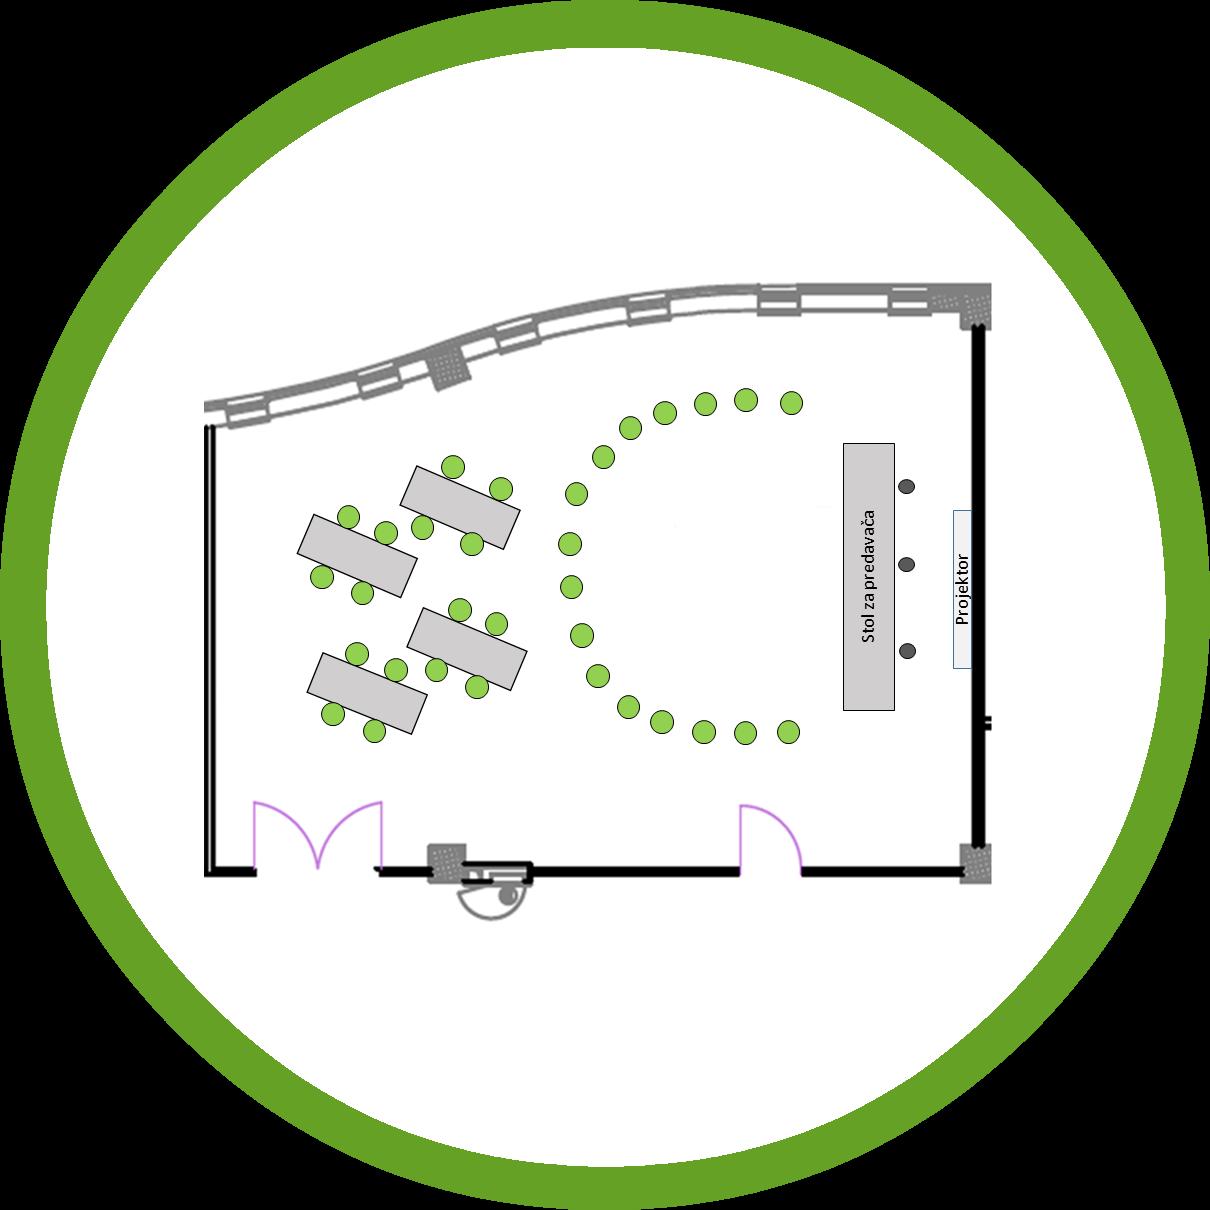 Dvorana Kaktus postav radionica 16 osoba